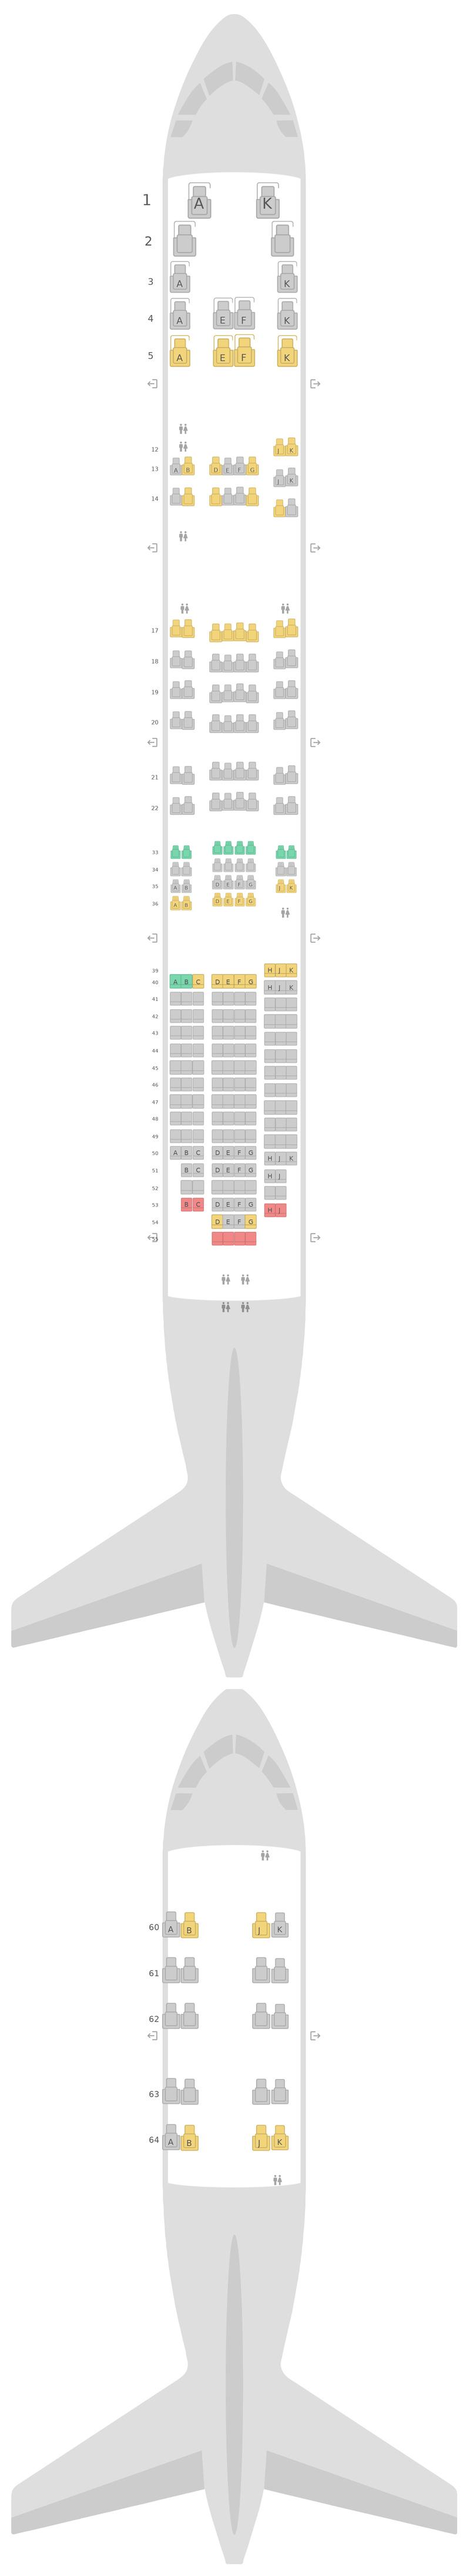 Схема салона Боинг 747-400 (744) v2 Бритиш Эйрвейз